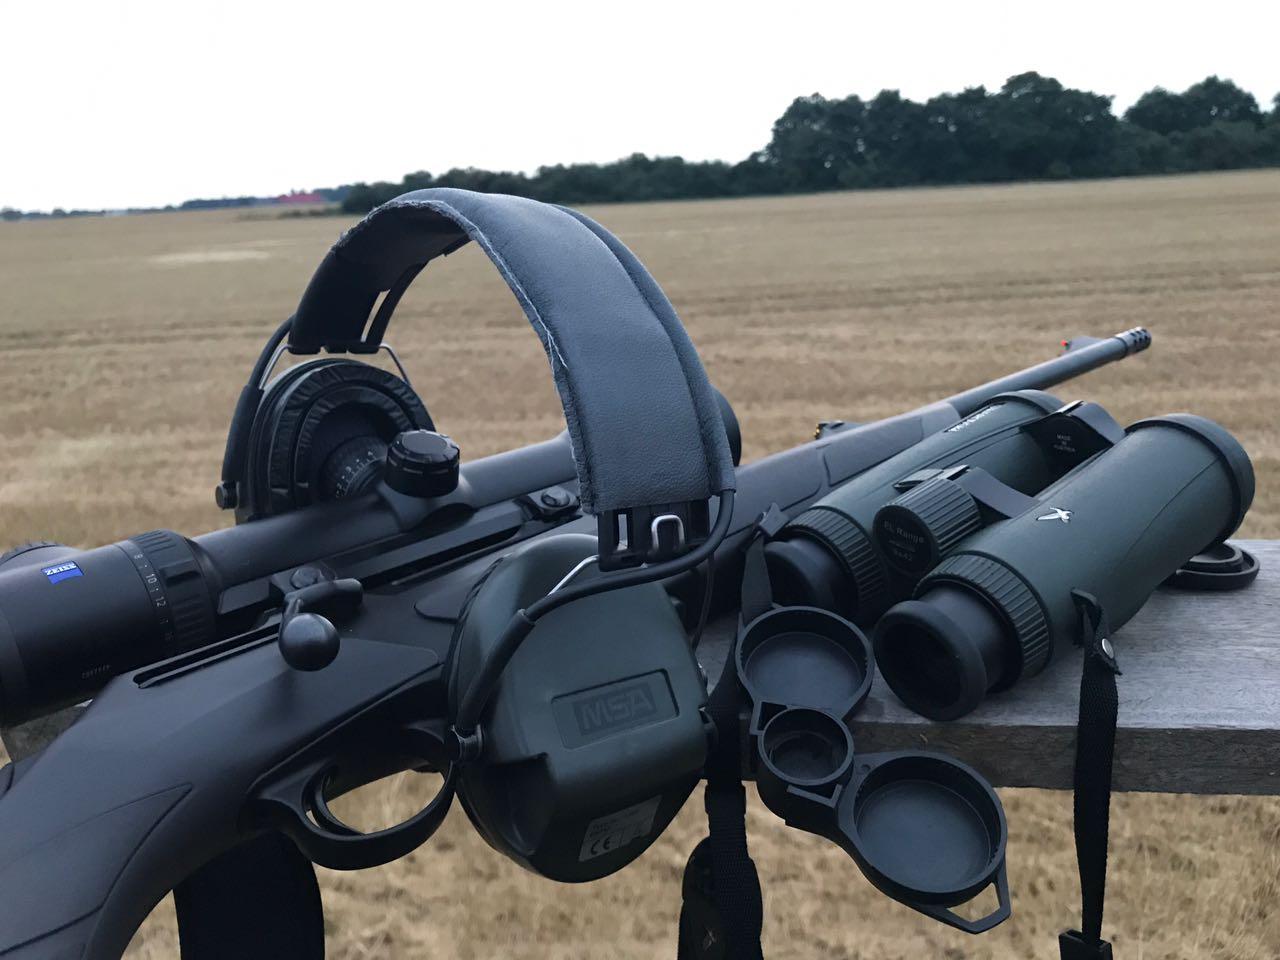 Vollmond Jagd Entfernungsmesser : Jagdausrüstung für jungjäger jagdprinz